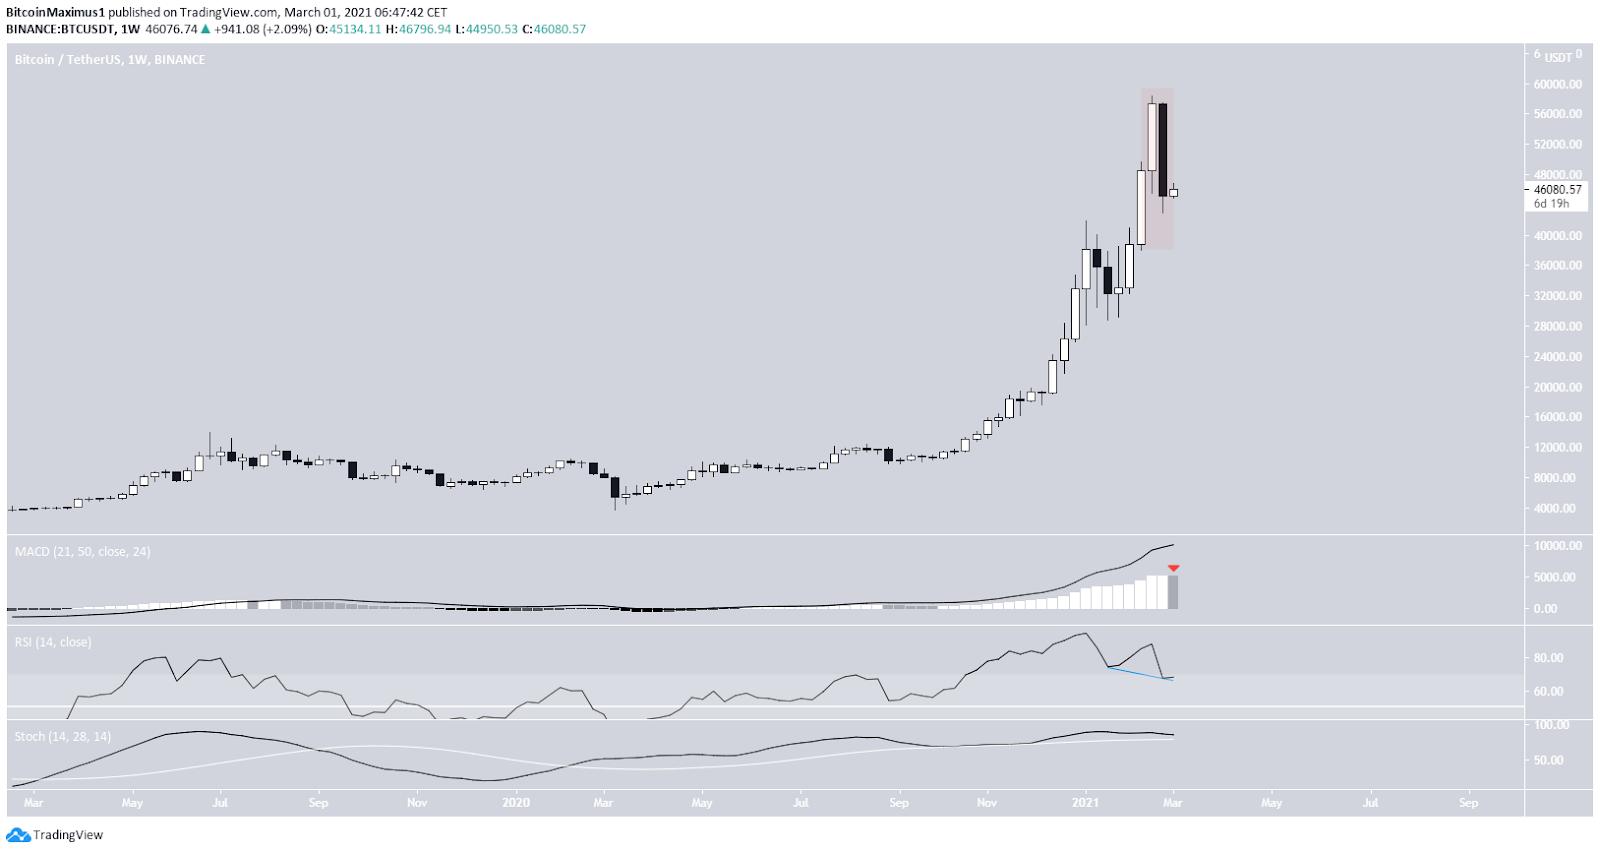 Bitcoin Preis Wochenchart